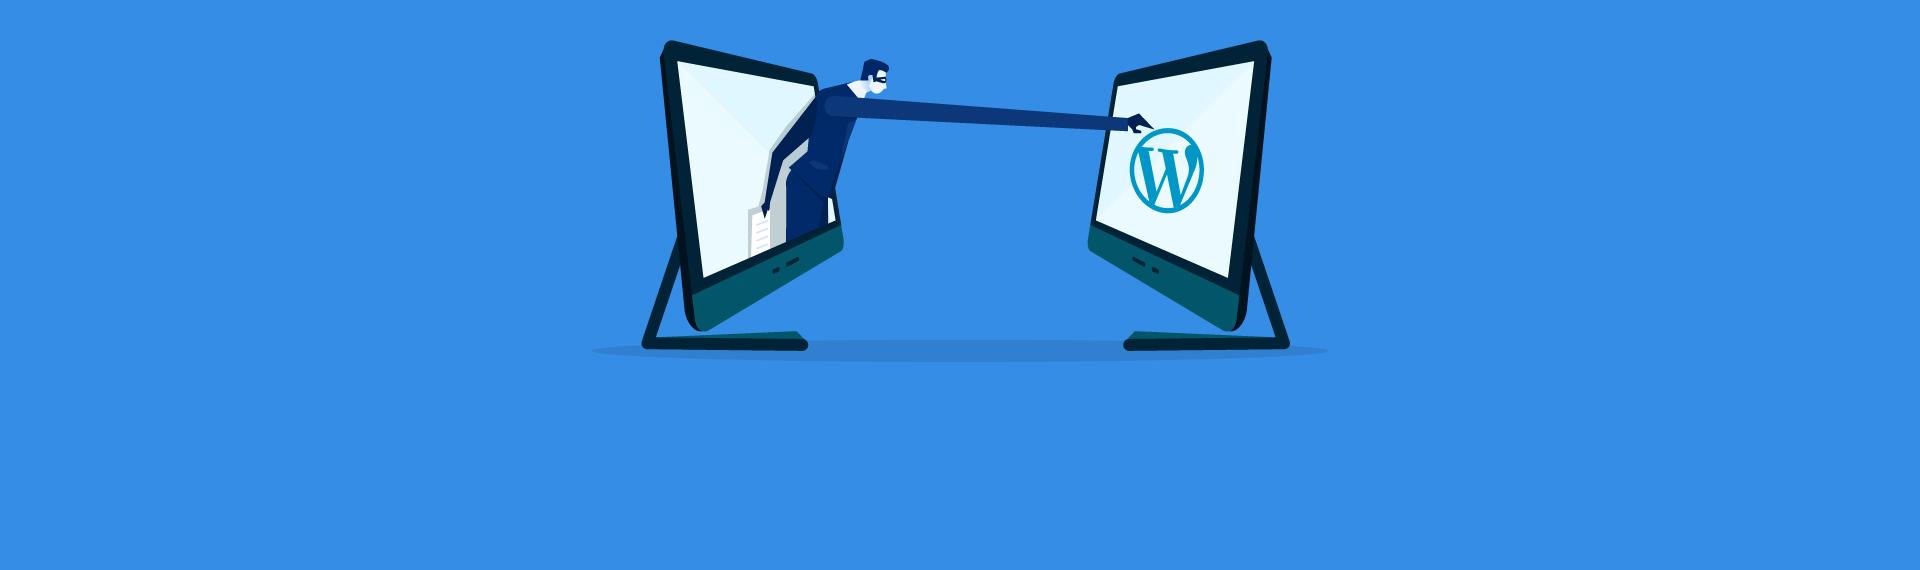 WordPress hacks